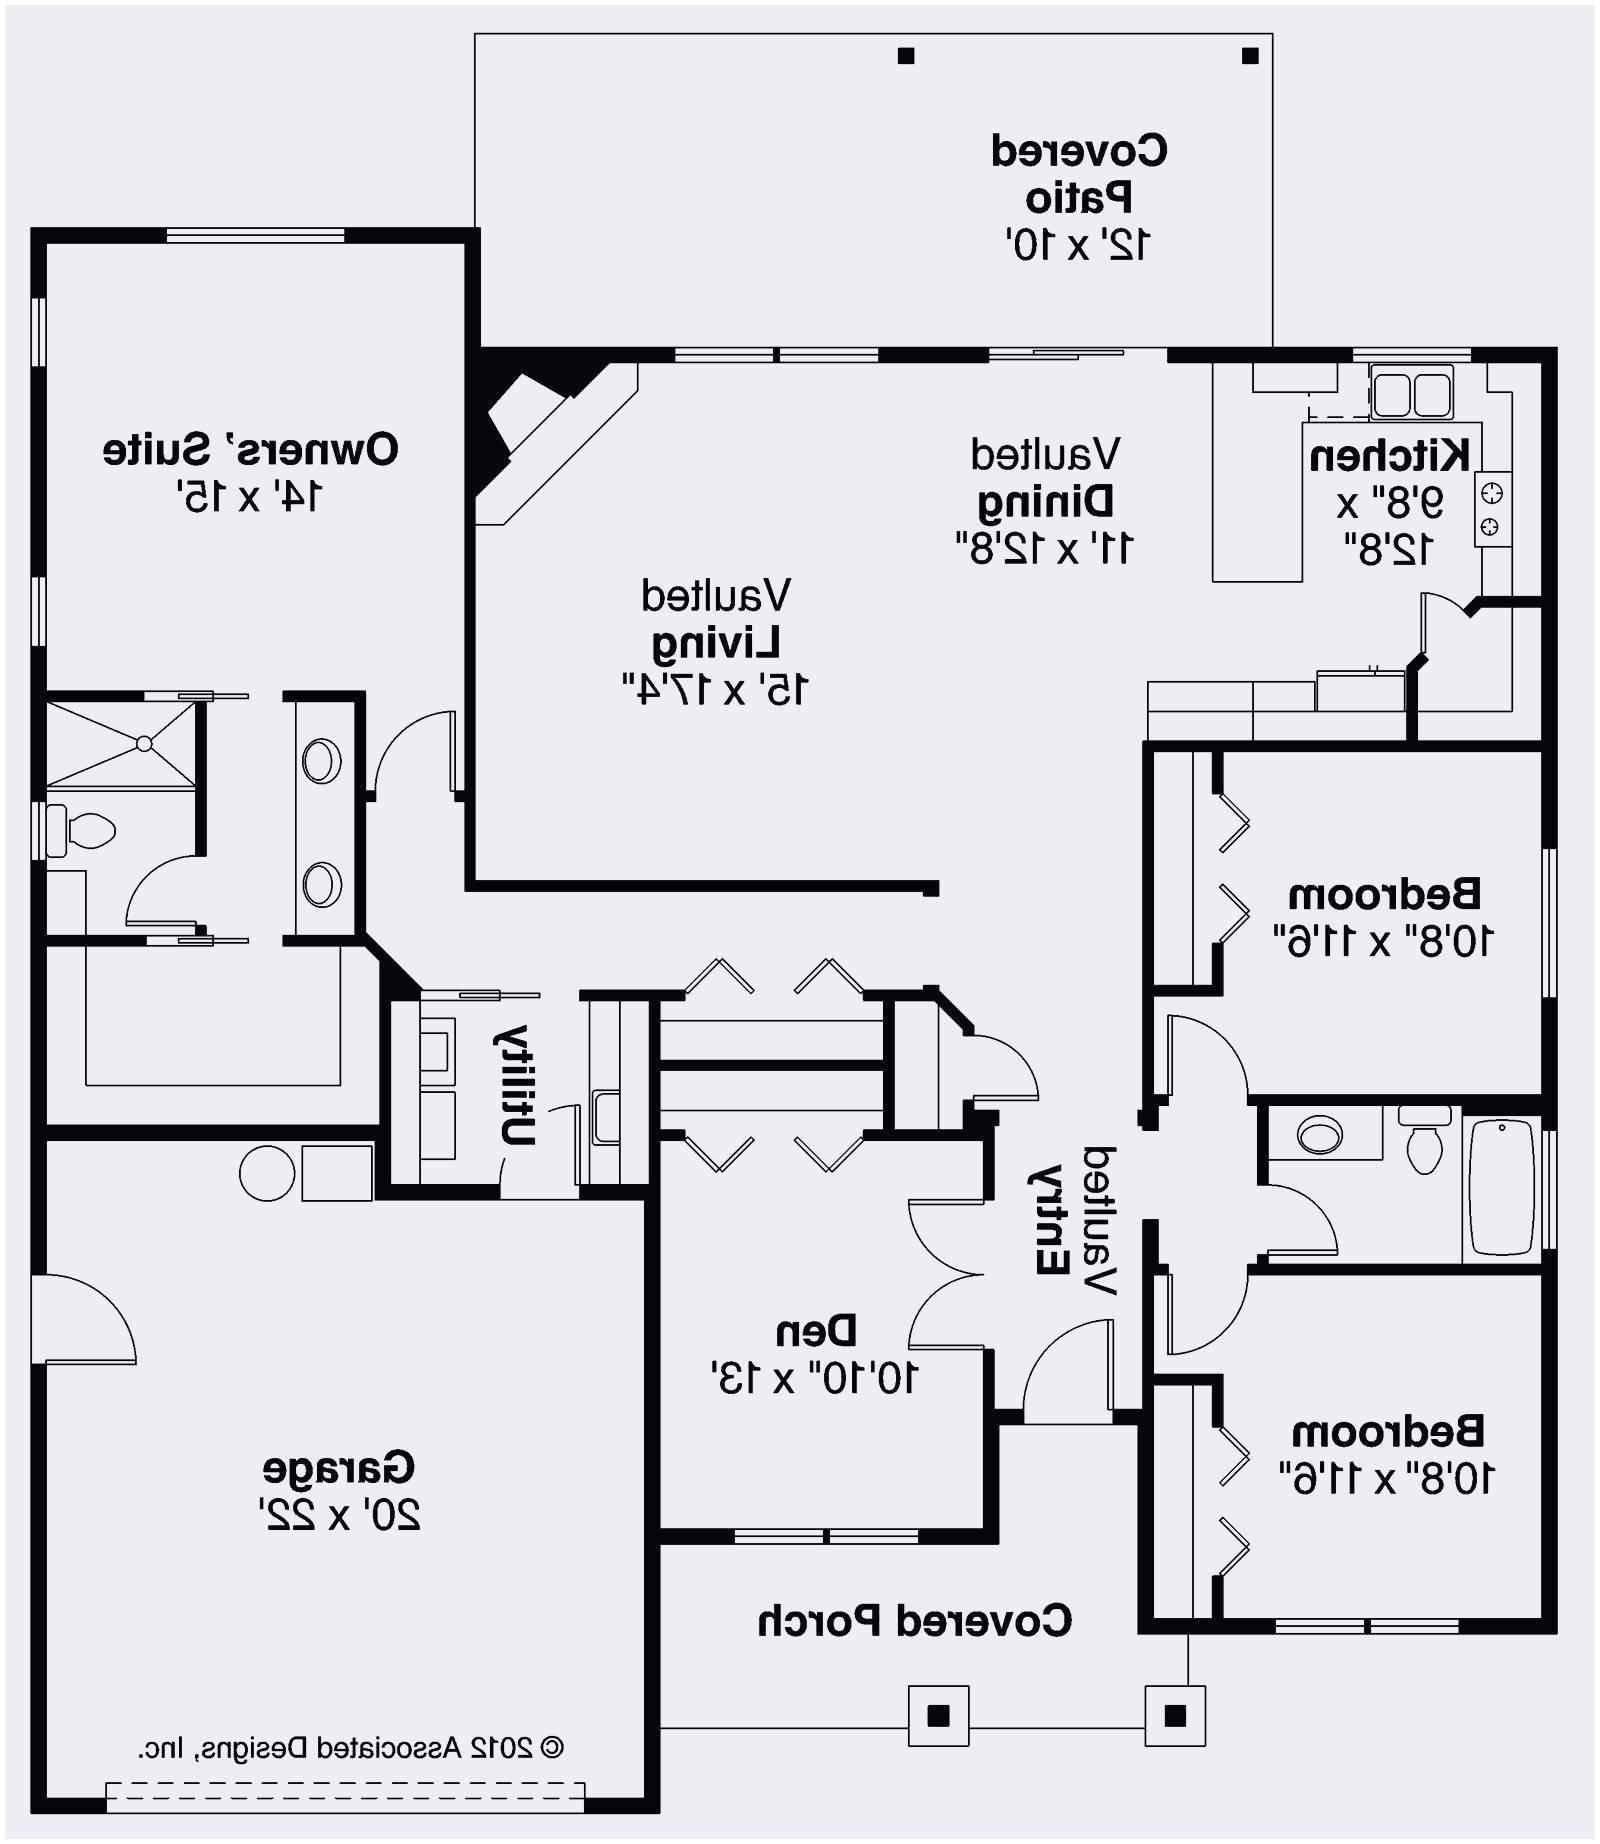 Fresh Wiring Diagram for House Lights Fresh House Wiring Diagram for Best Plan Diagram